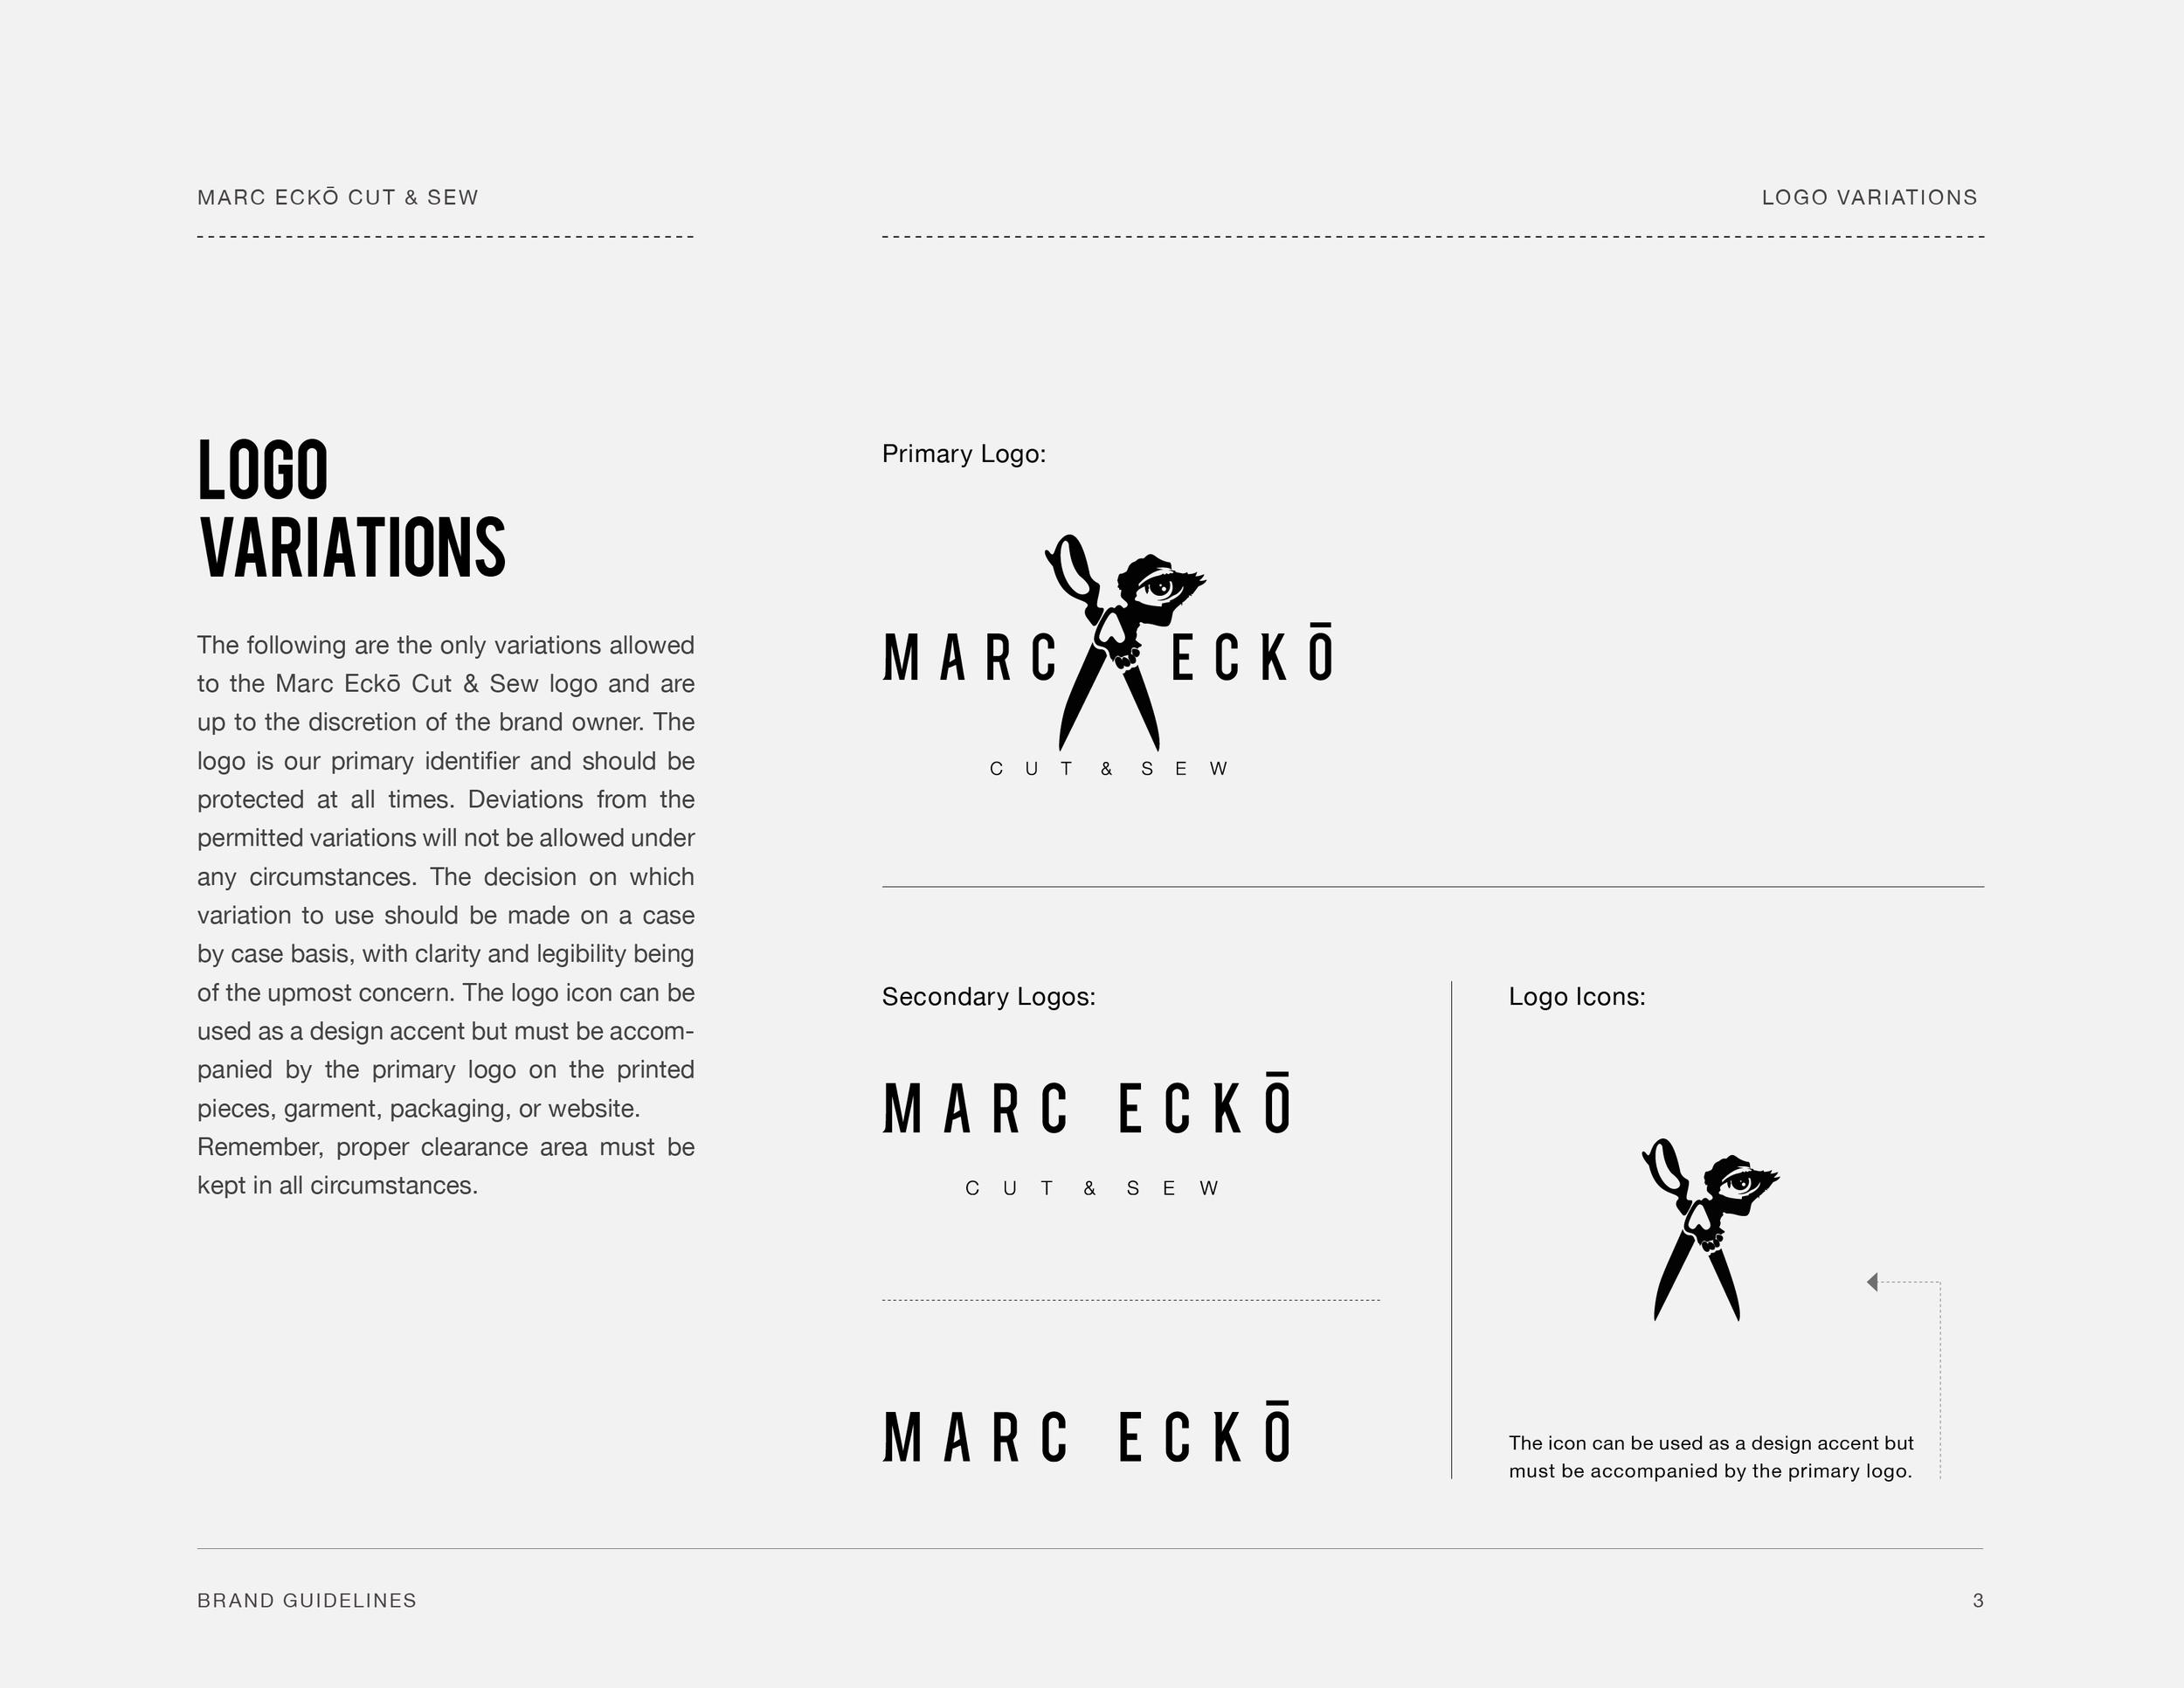 Marc-Ecko-brand-guidelines6.jpg